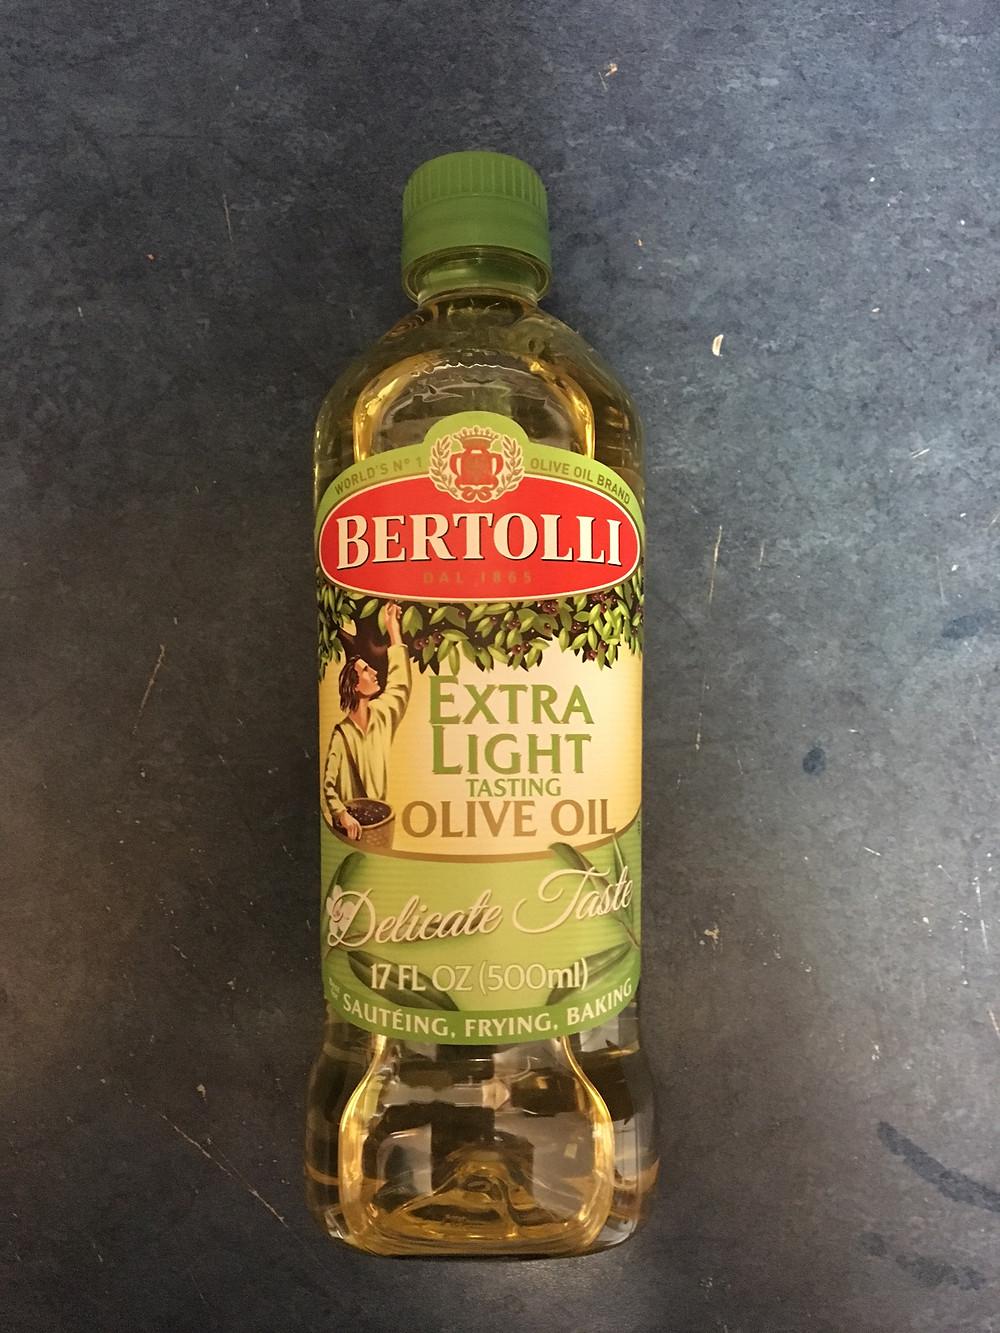 Bertolli's Extra LIGHT Olive Oil